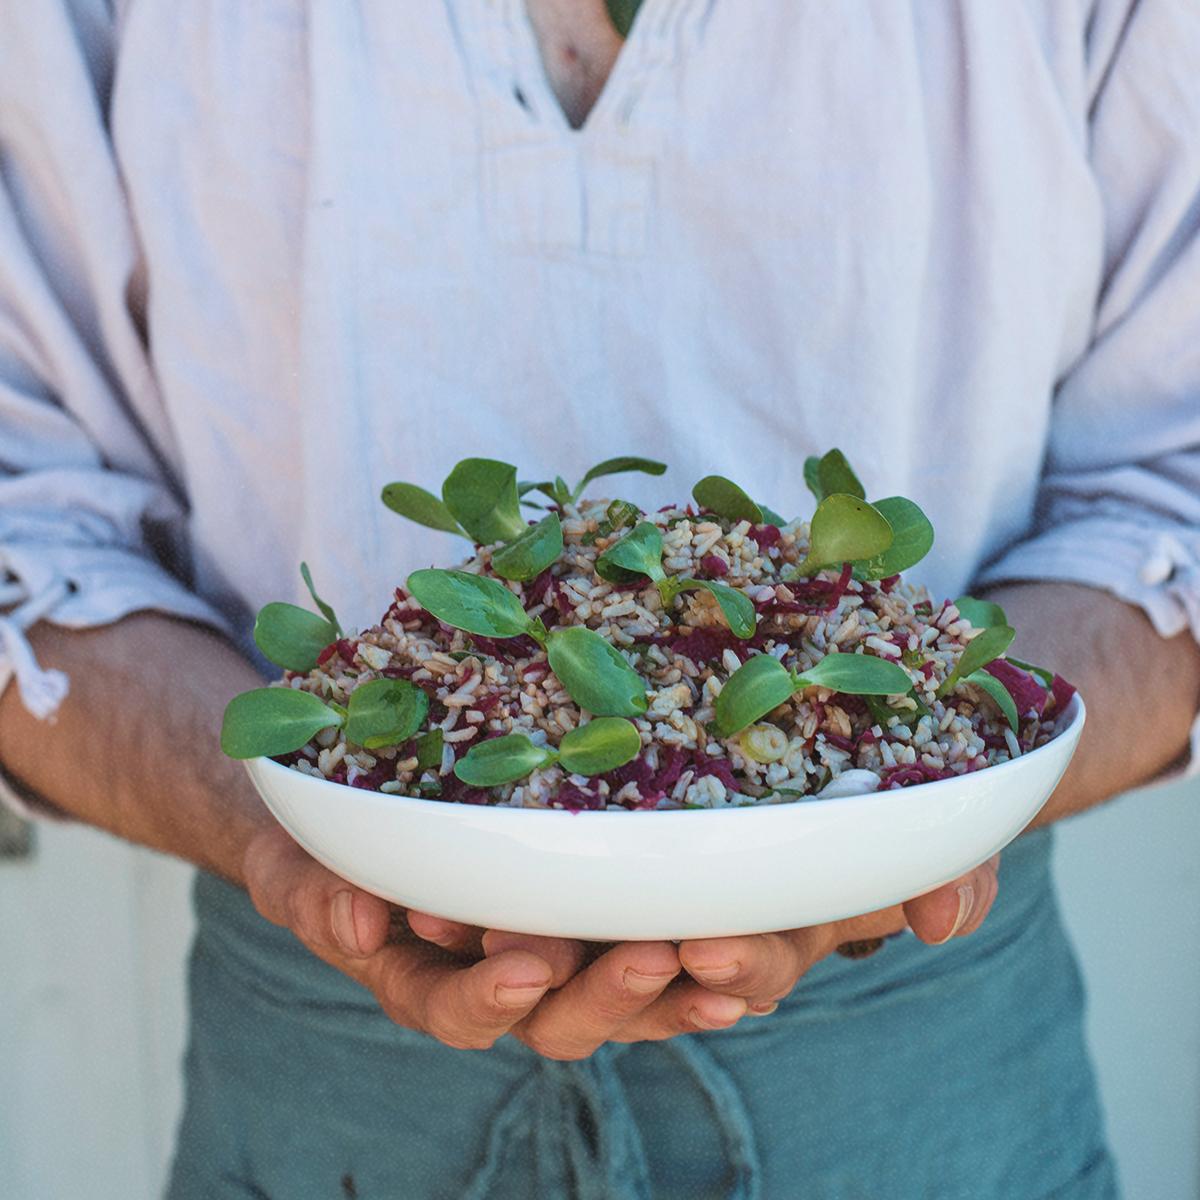 Colourful salad bowl